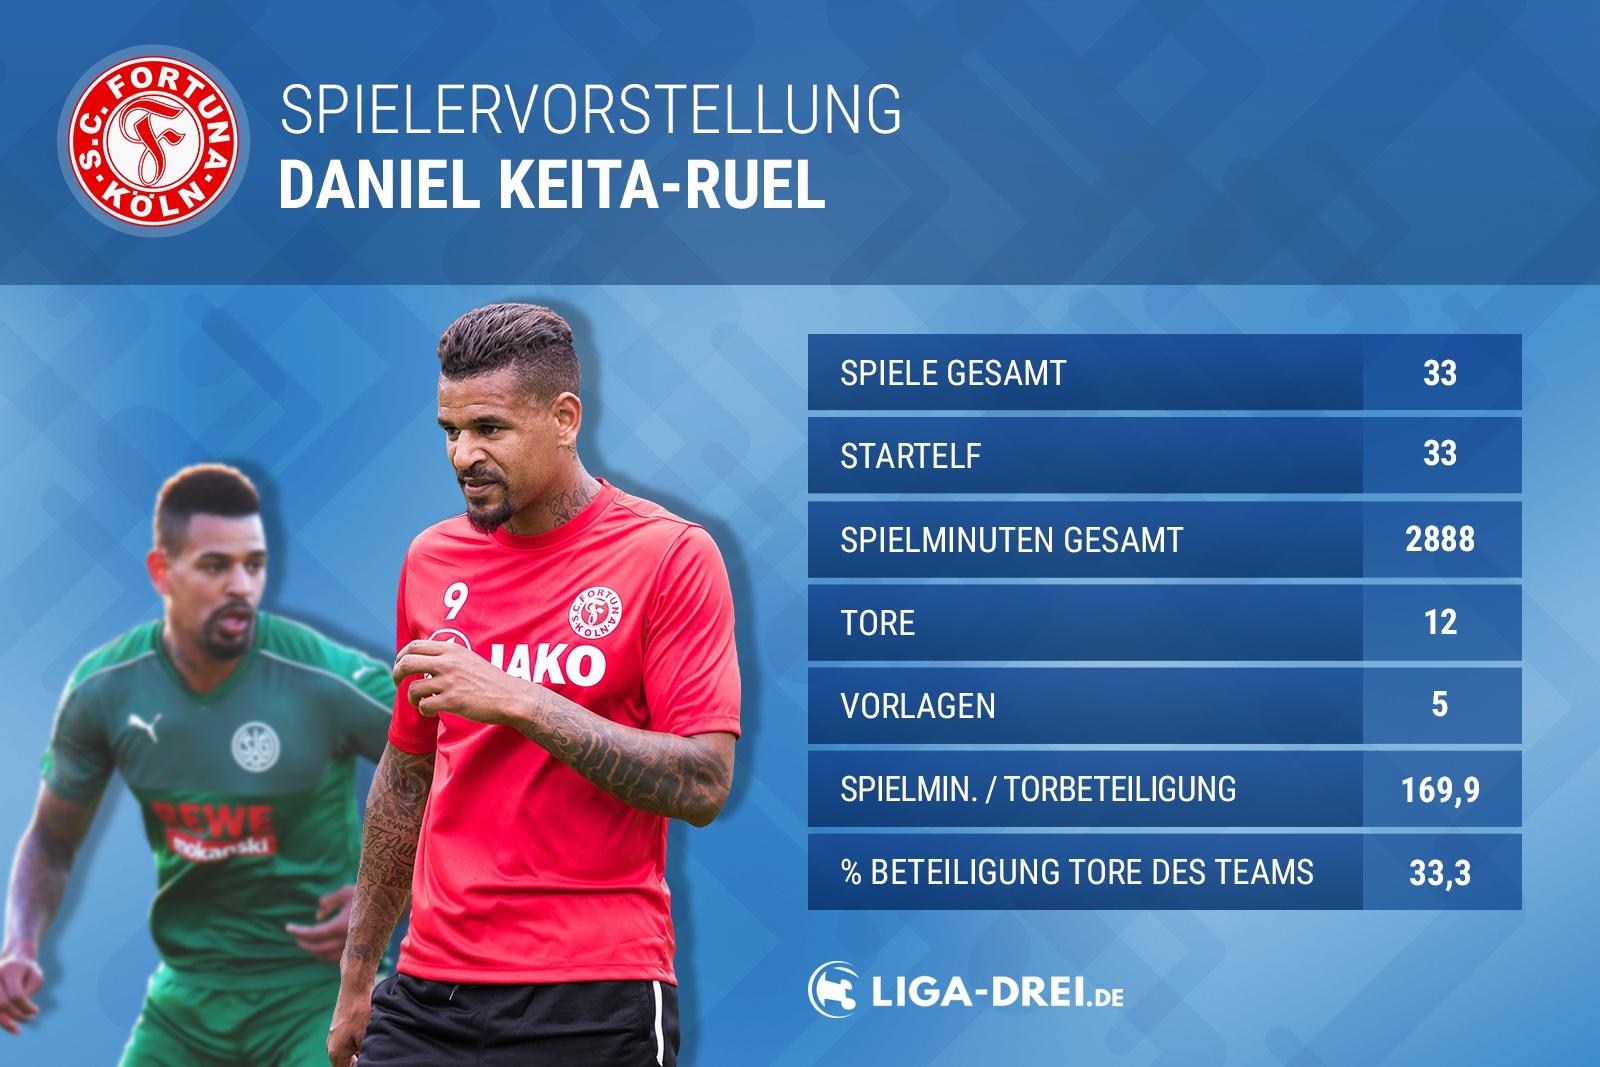 Neuling der Liga: Daniel Keita-Ruel